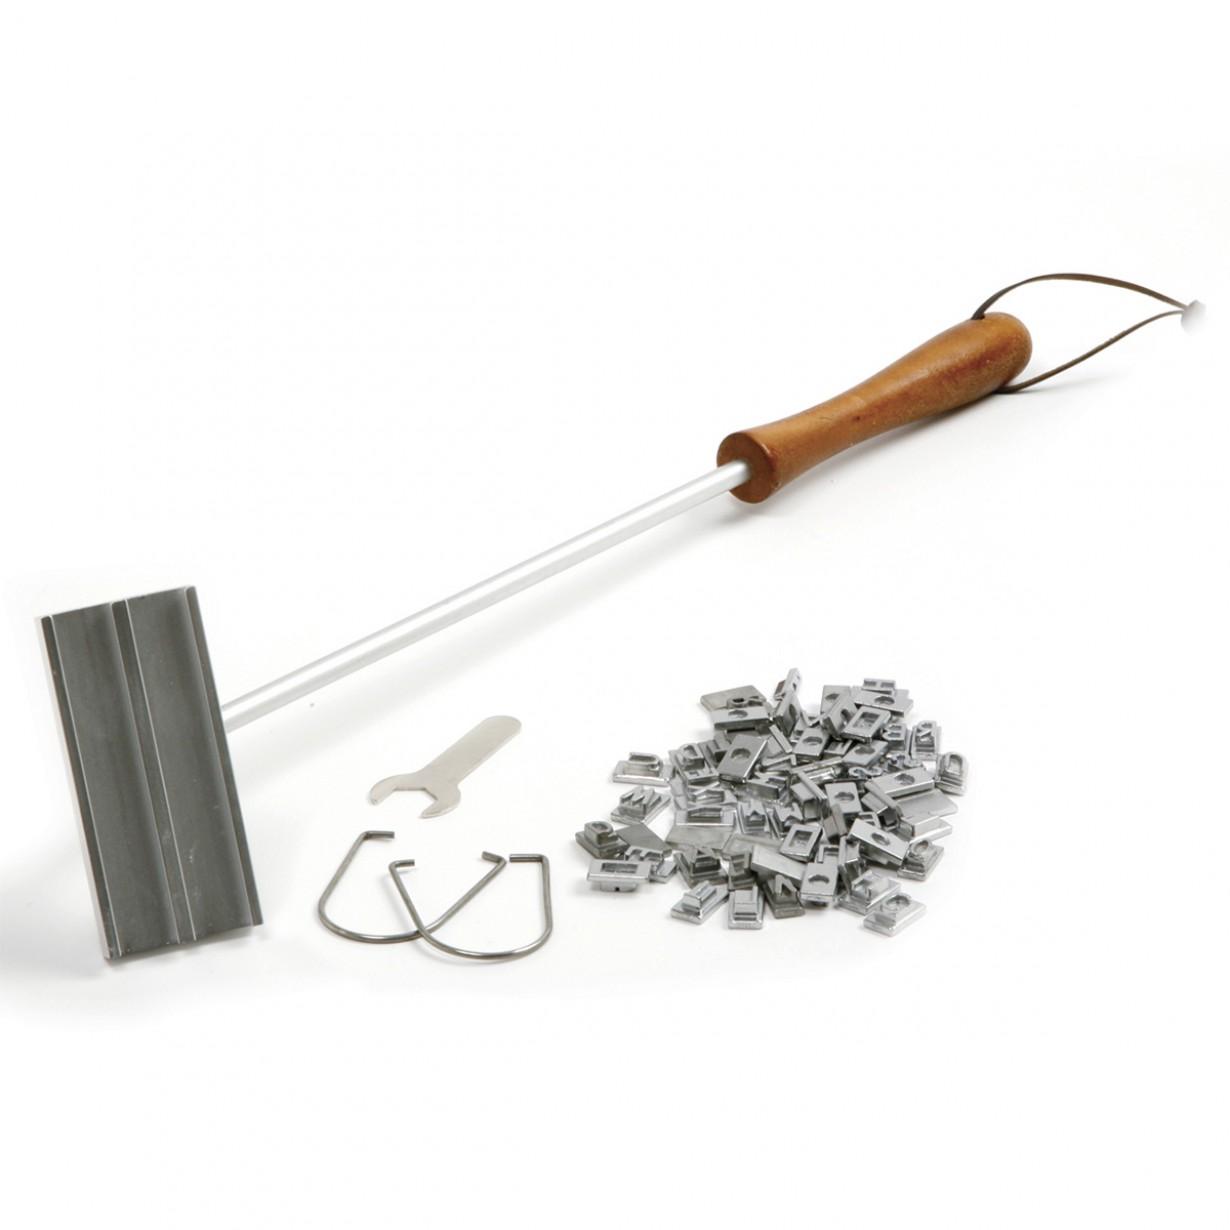 bbq-branding-tool-eae